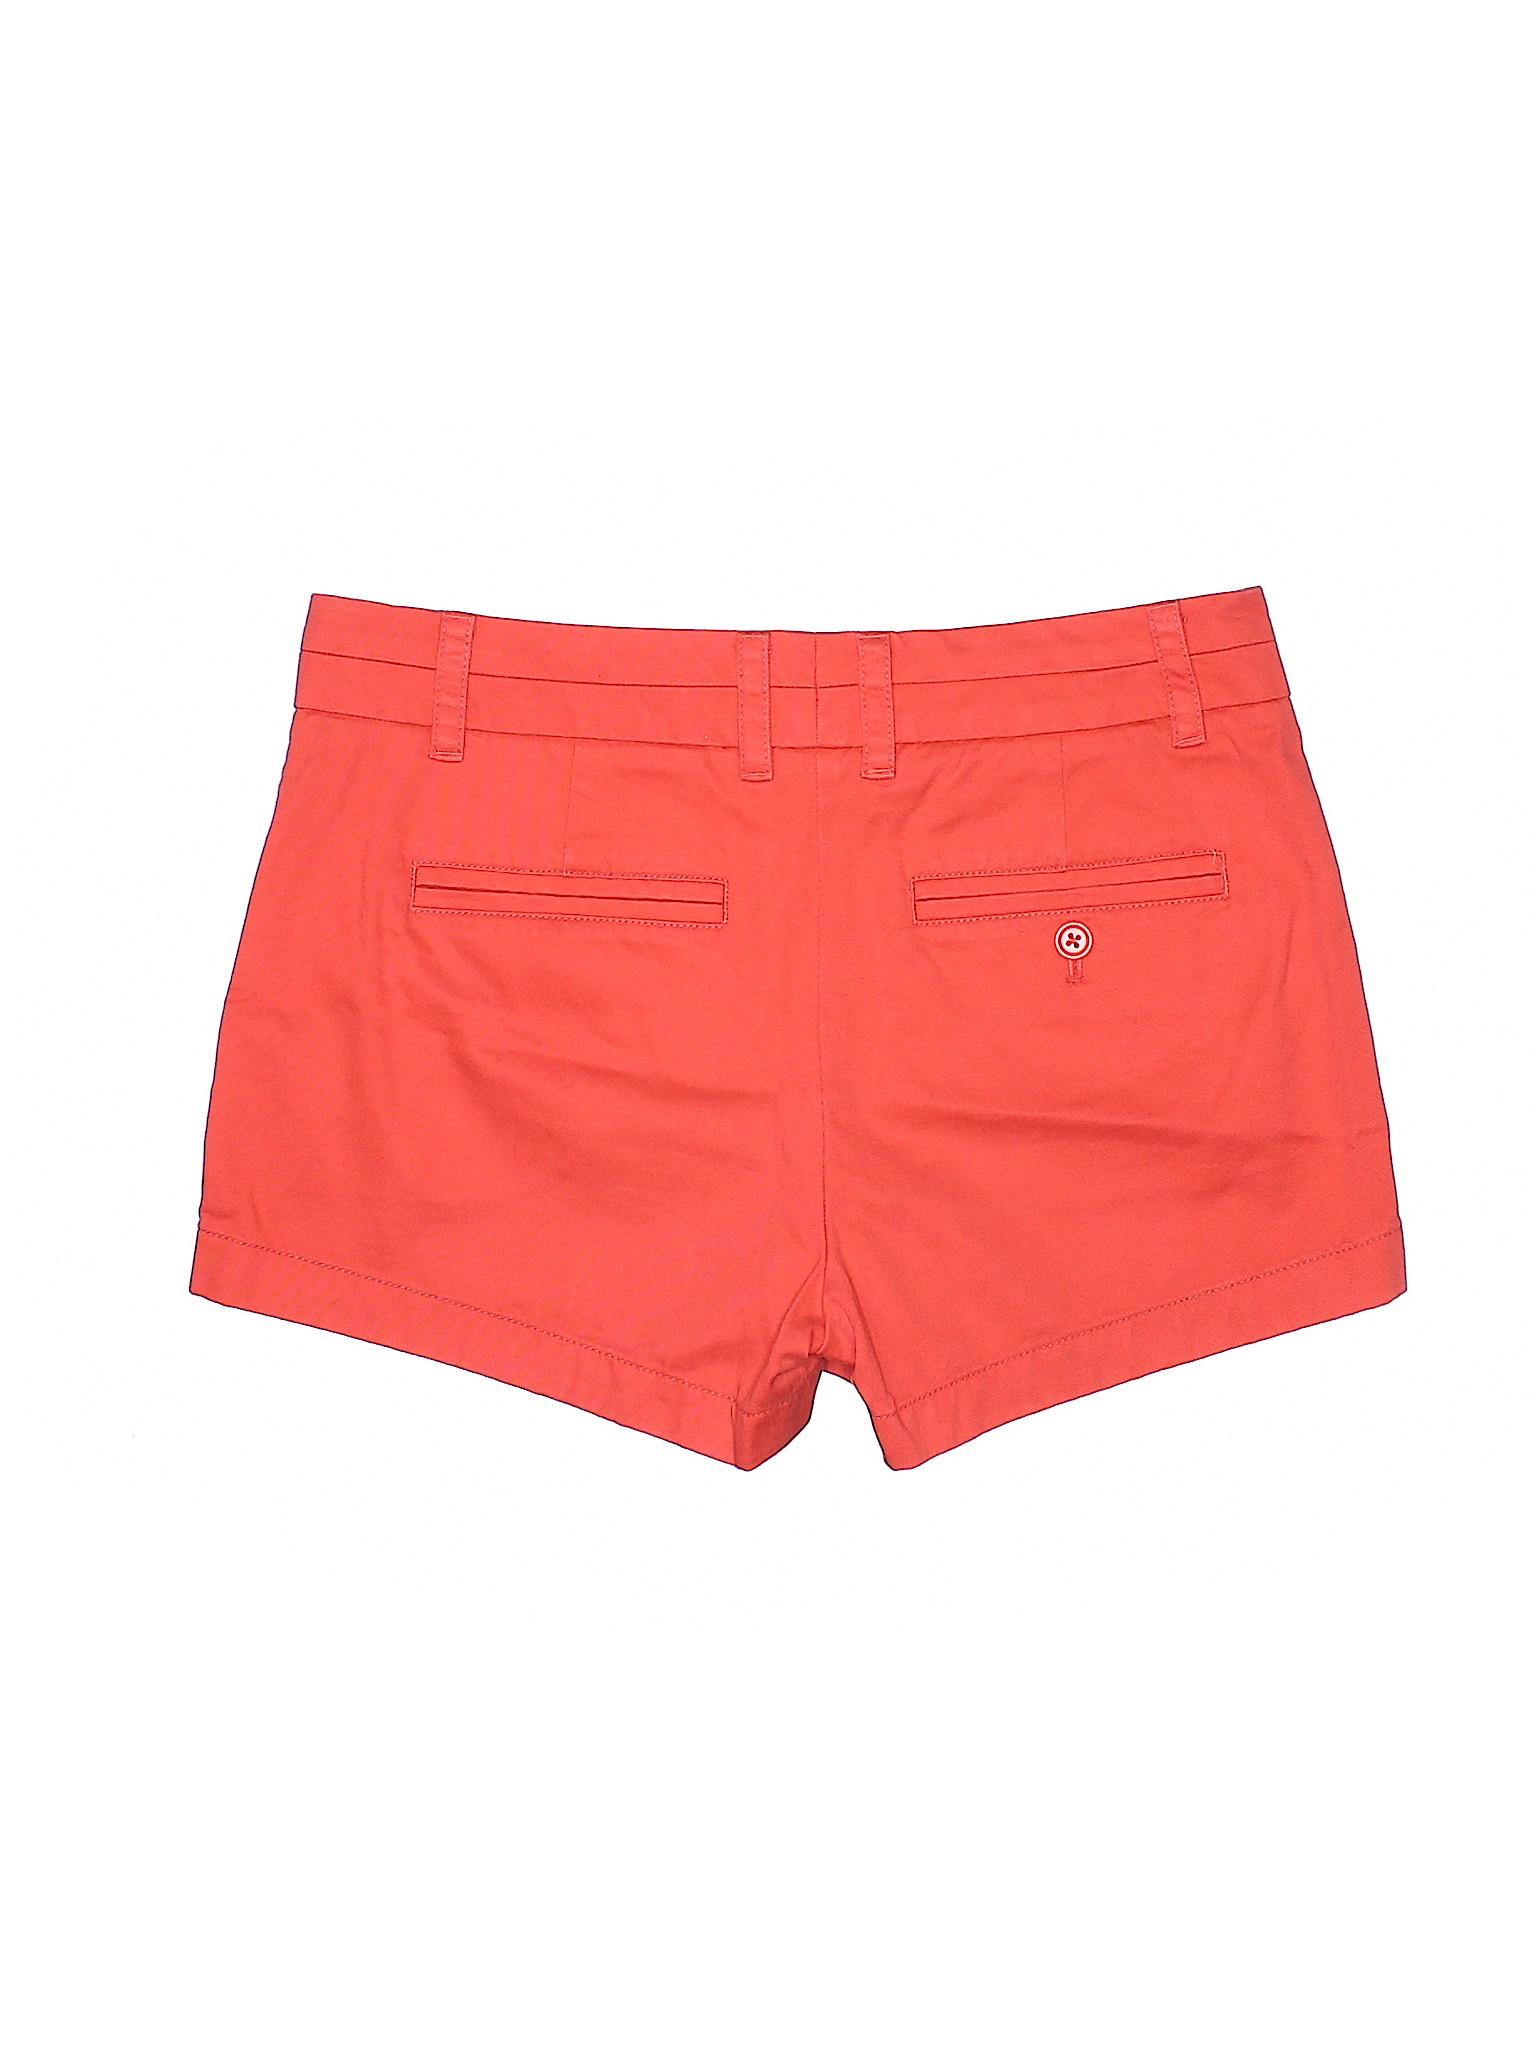 J Shorts Shorts Khaki Crew Boutique Khaki J Crew Boutique J Boutique vTvdAwIq